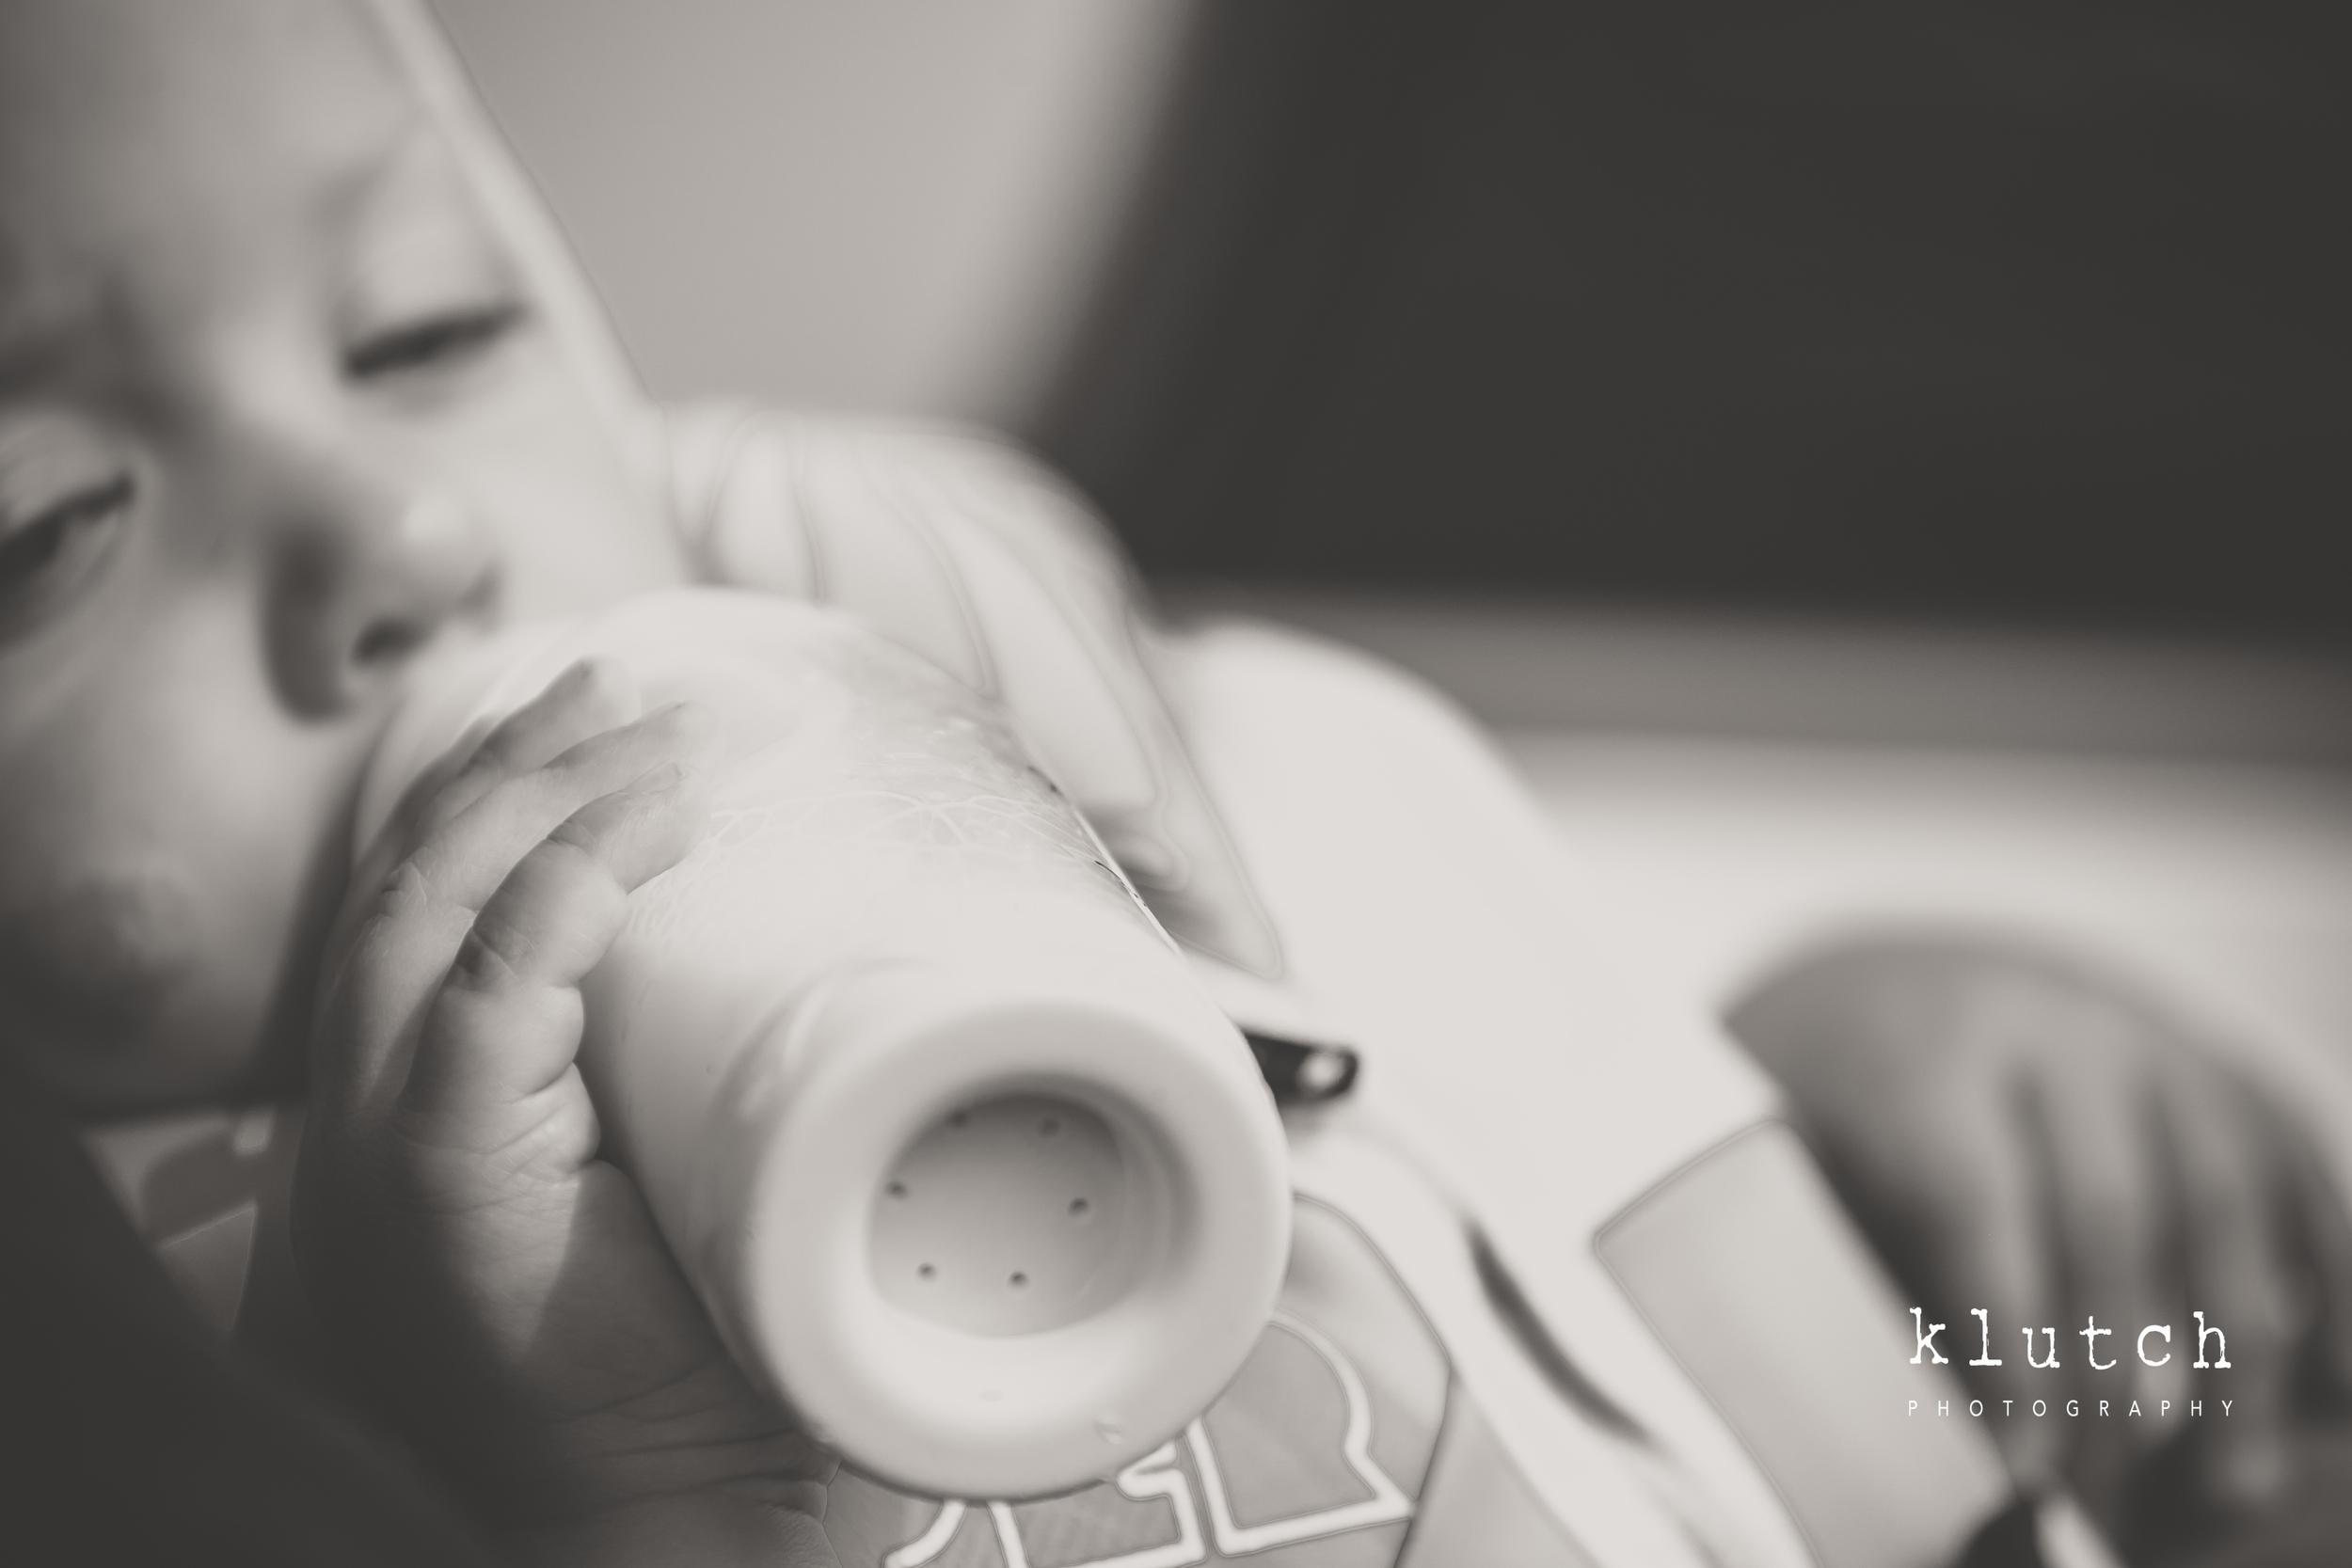 Klutch Photography,white rock family photographer, vancouver family photographer, whiterock lifestyle photographer, life unscripted photographer, life unscripted session, photography,Dina Ferreira Stoddard-1-27.jpg